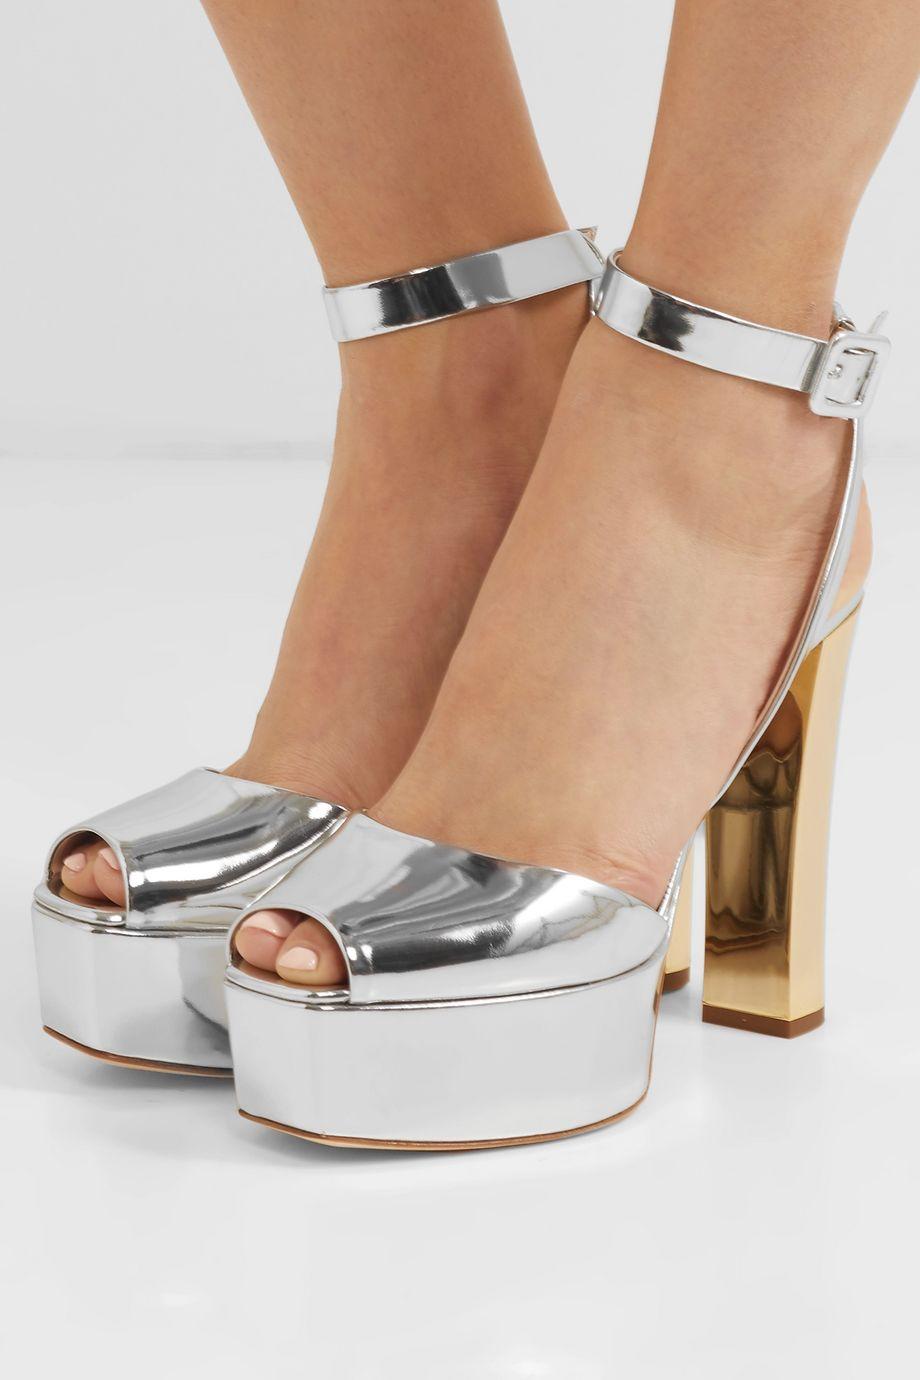 Giuseppe Zanotti Betty mirrored-leather platform sandals